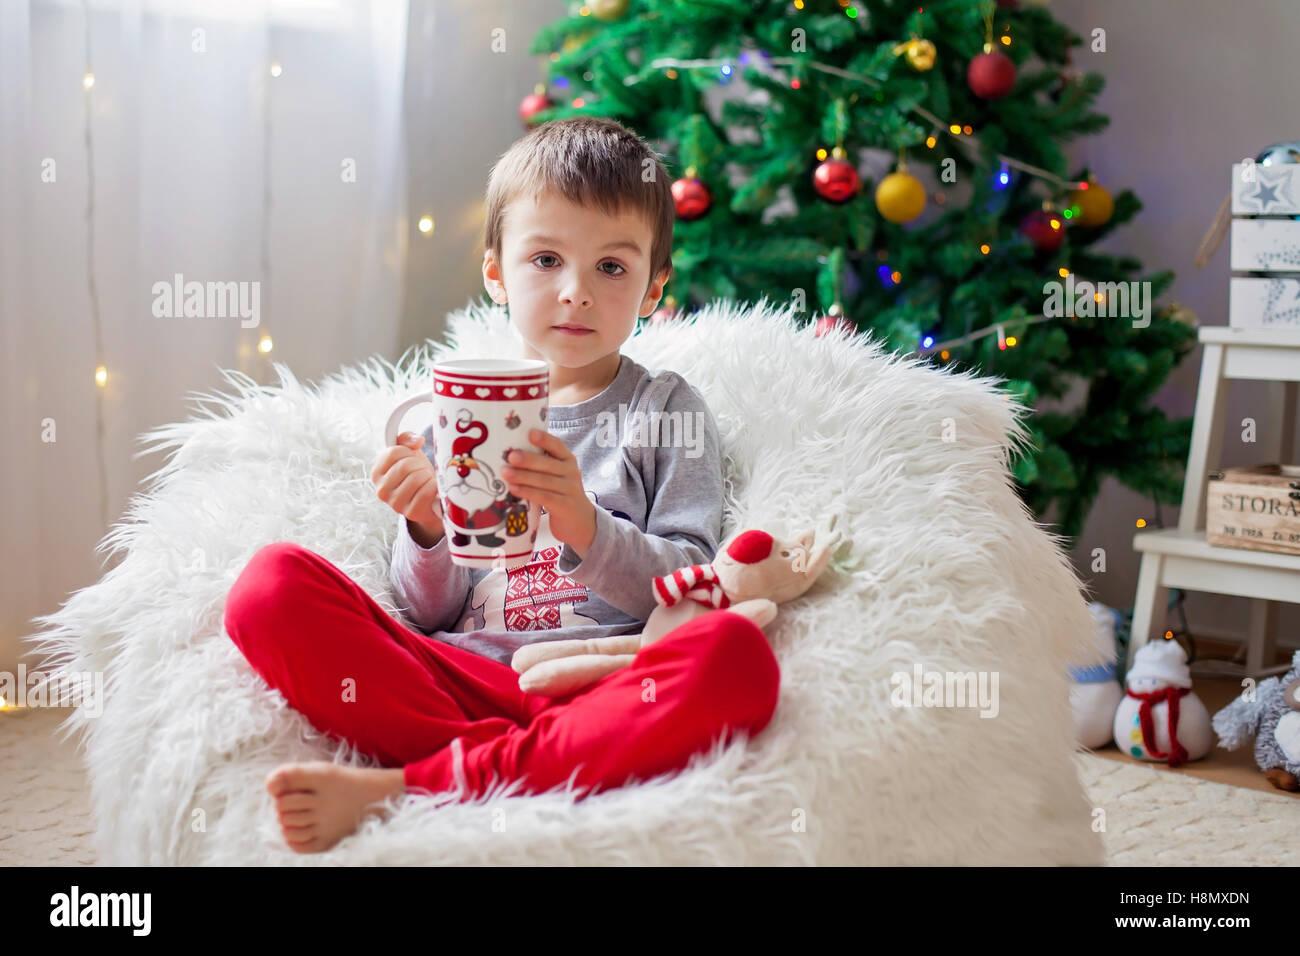 Cute boy, sitting on bean bag, drinking tea and enjoying Christmas holidays, Christmas decoration around him - Stock Image